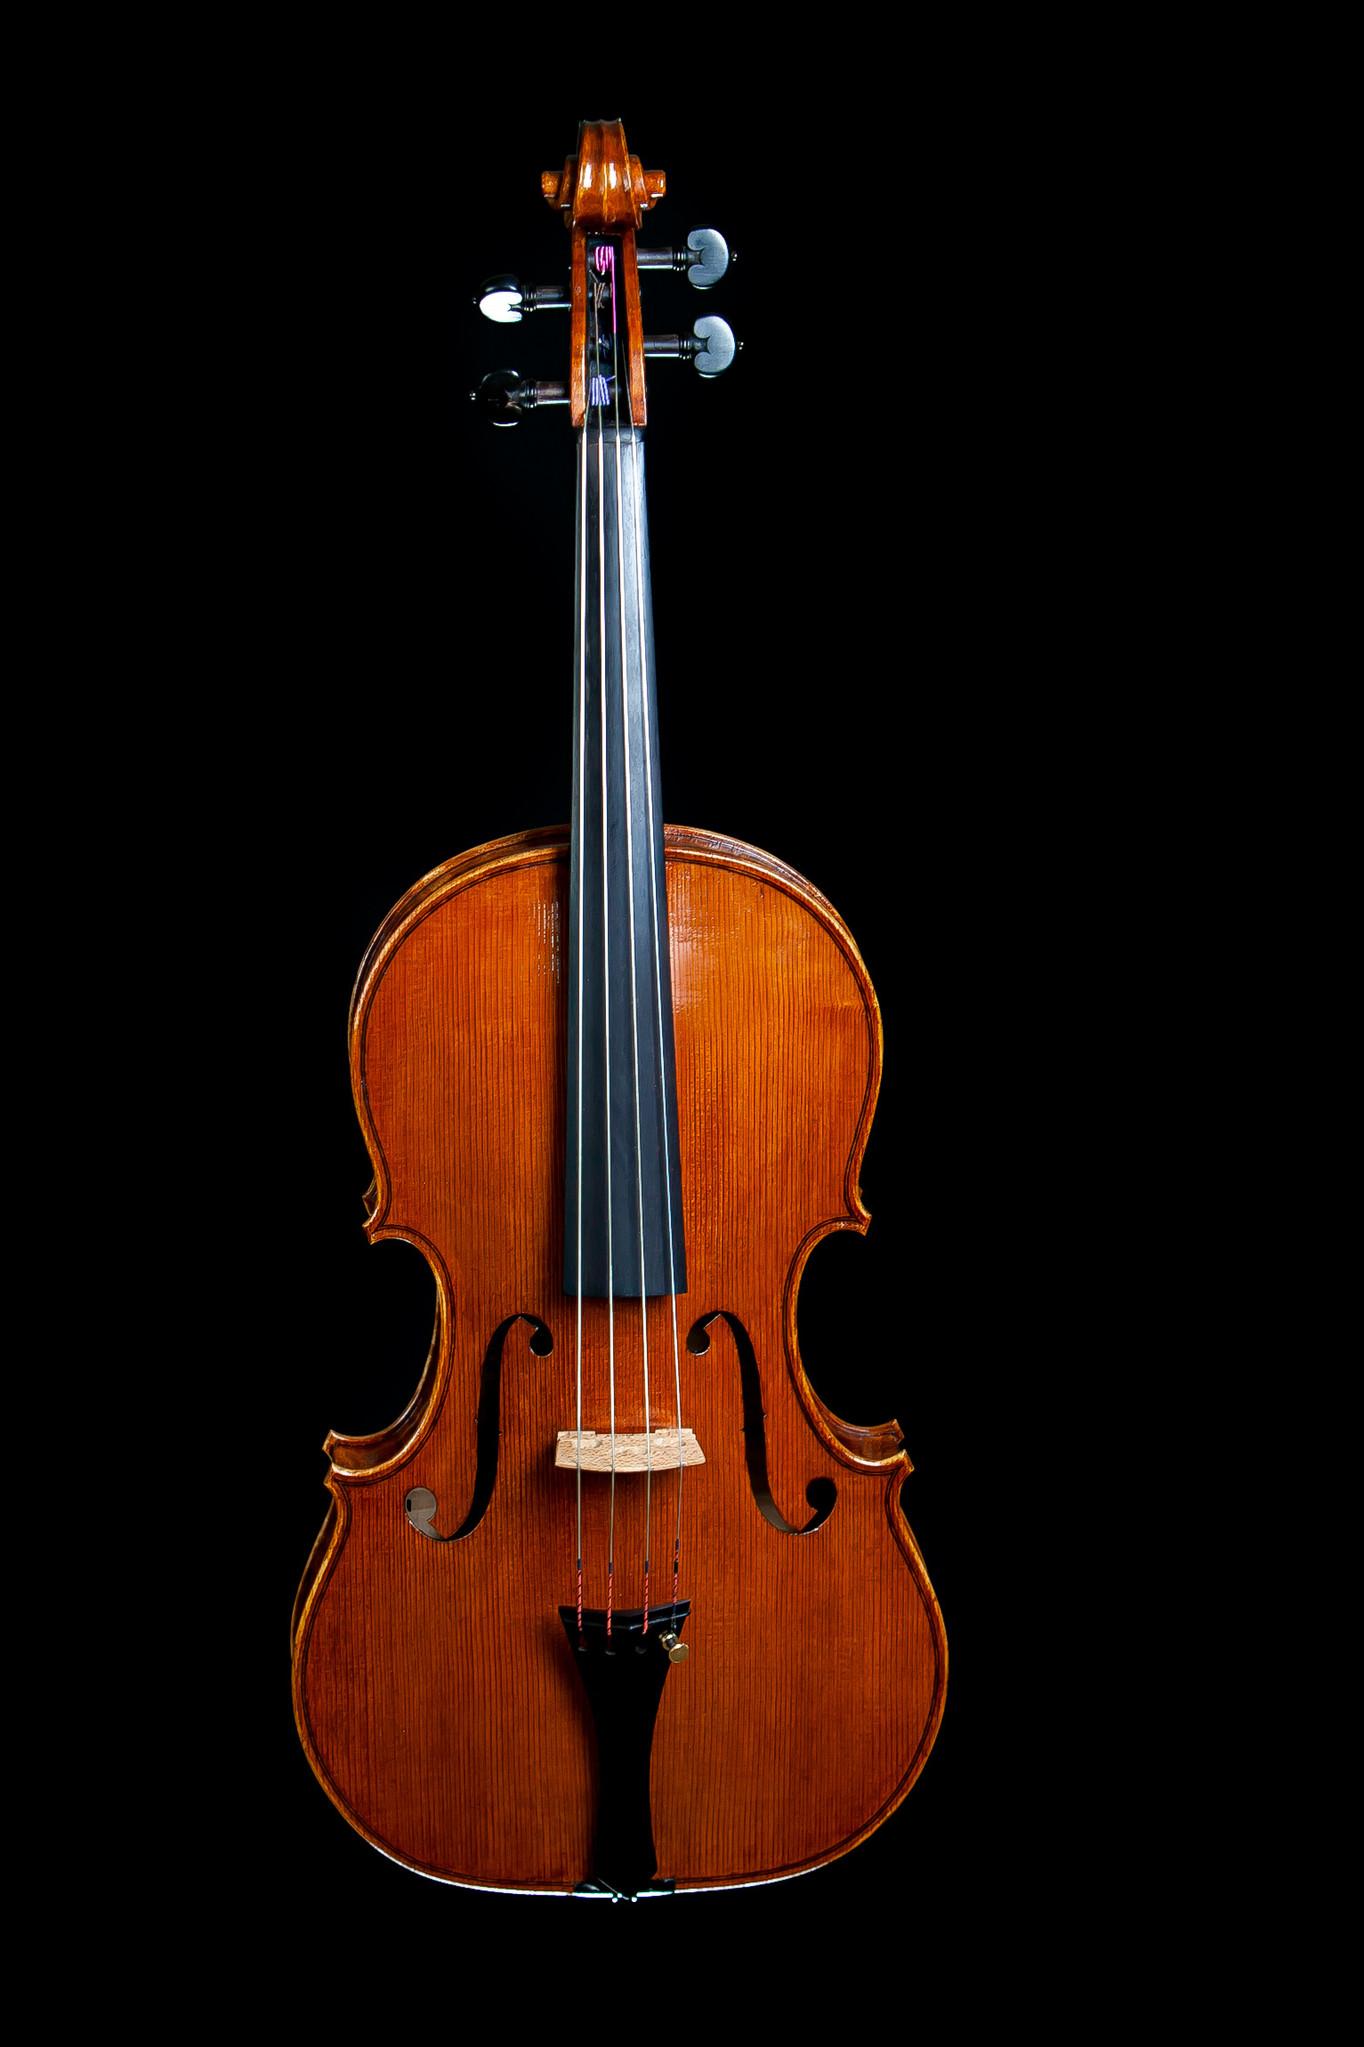 "16 1/8"" Jeff Lee Manthos viola, 2020, no. 89, Corvallis OR"